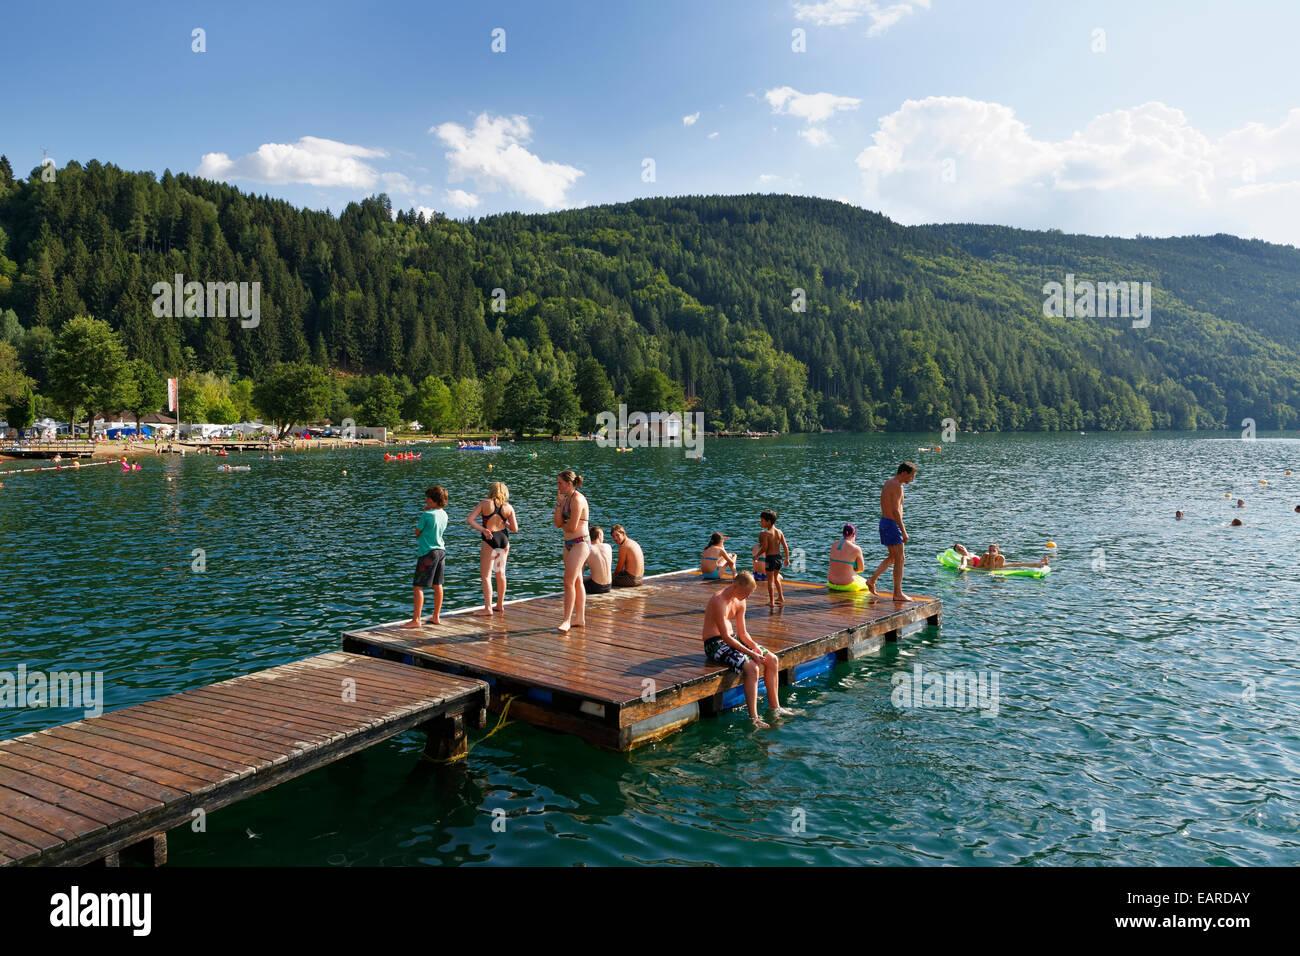 Bathing pontoon on Lake Millstatt, Döbriach, Radenthein, Spittal an der Drau, Carinthia, Austria - Stock Image